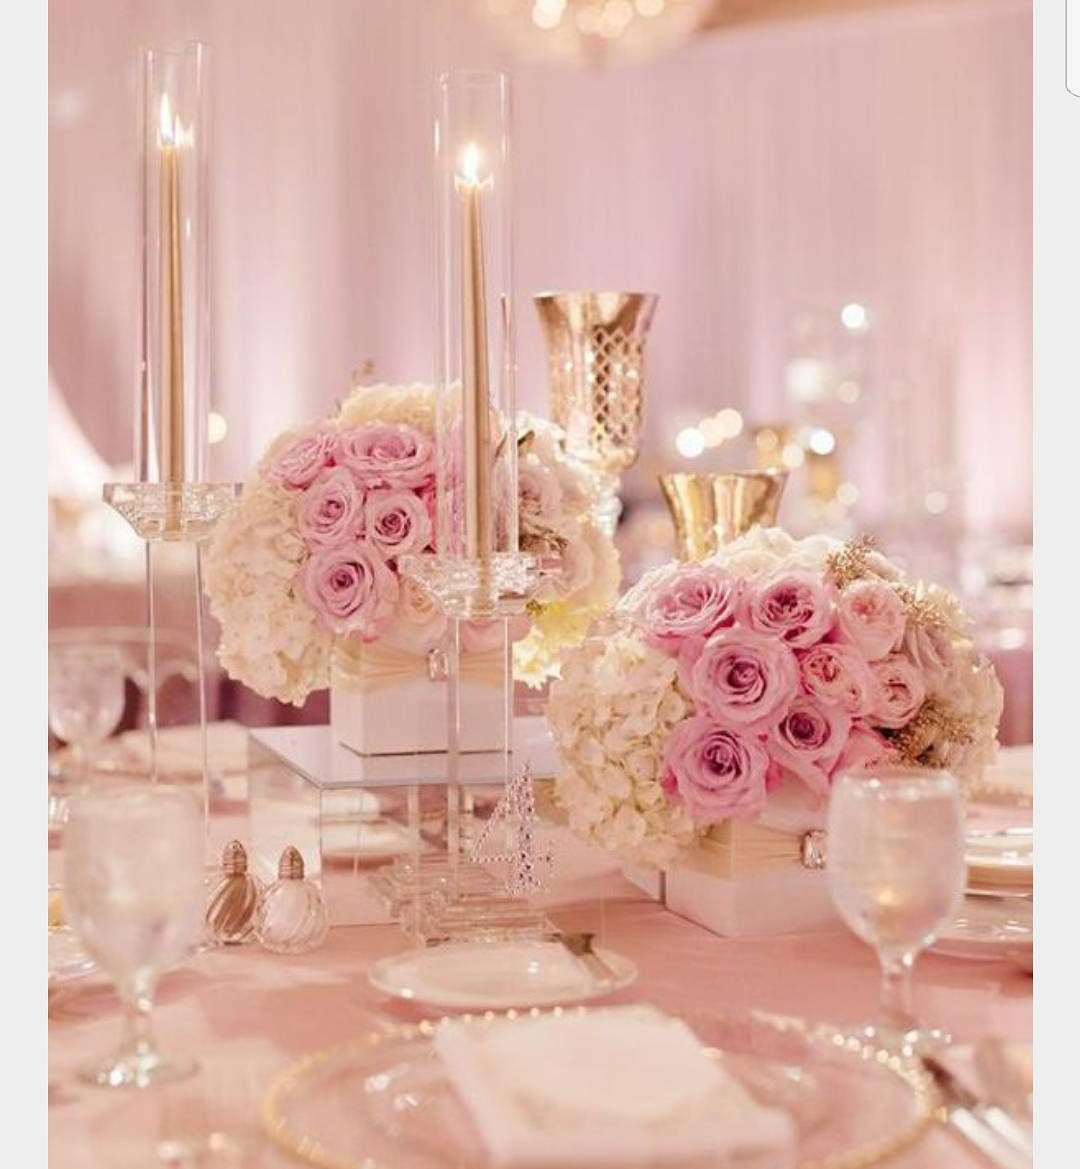 Classy and elegant #pinkwedding #weddinginspiration #wedding ...